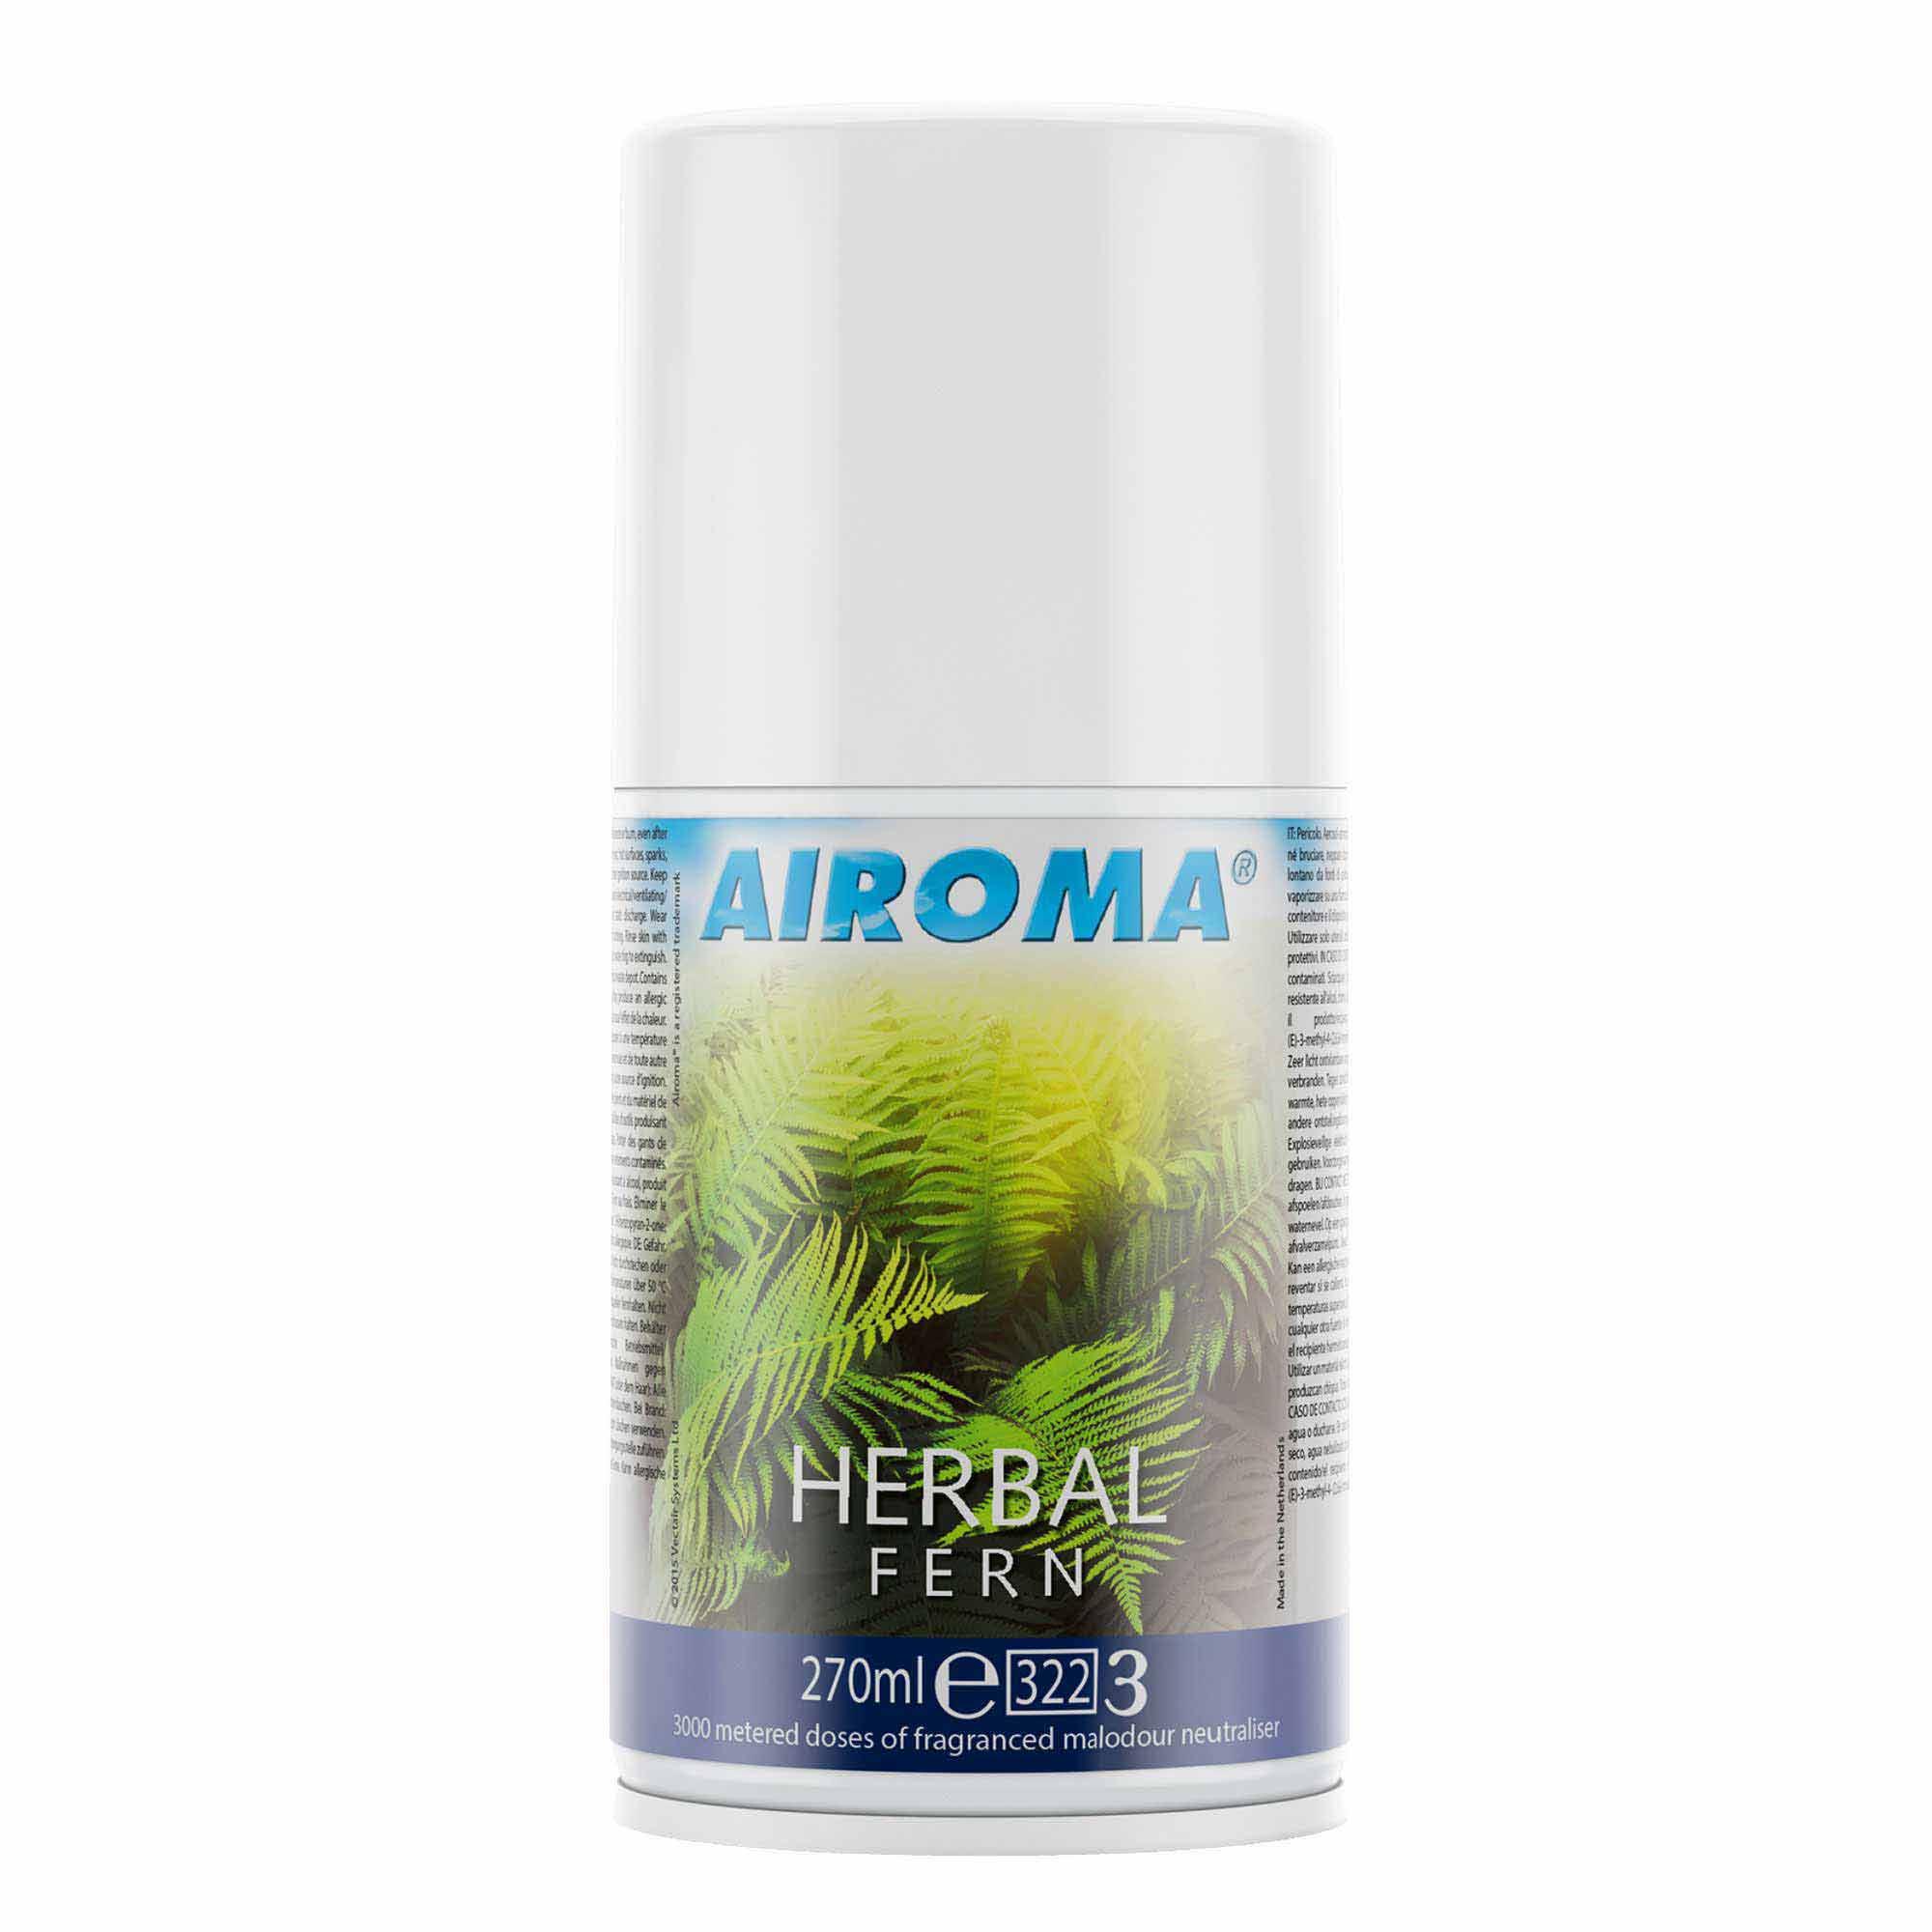 Airoma® Herbal Fern